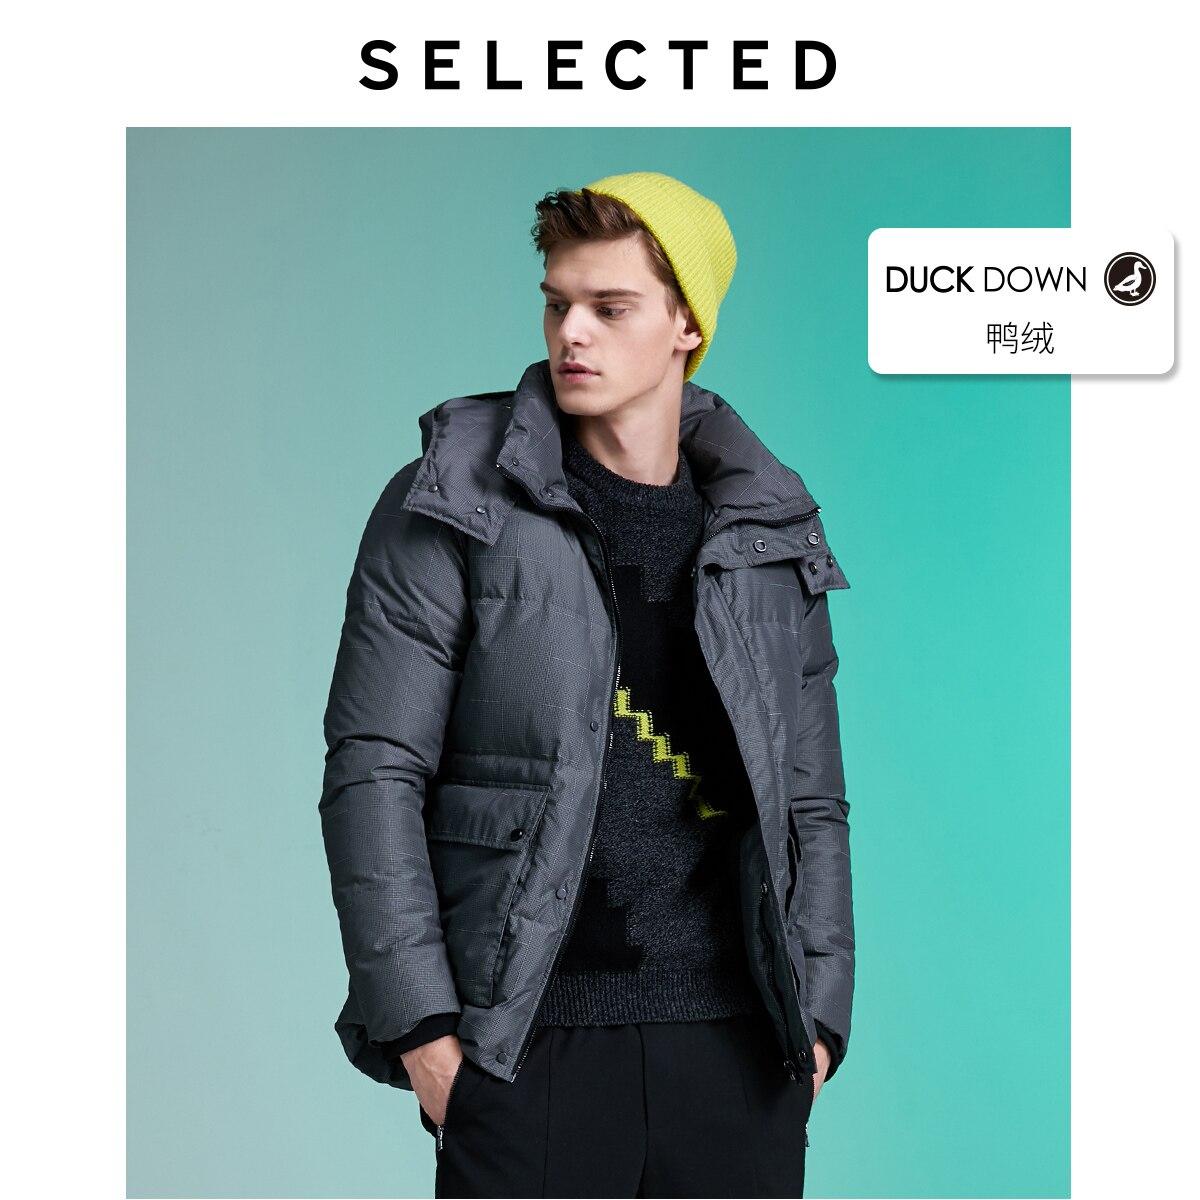 SELECTED Men's Contrasting Plaid Down Jacket Winter Parka Outwear Warm Male Coat L|419412570